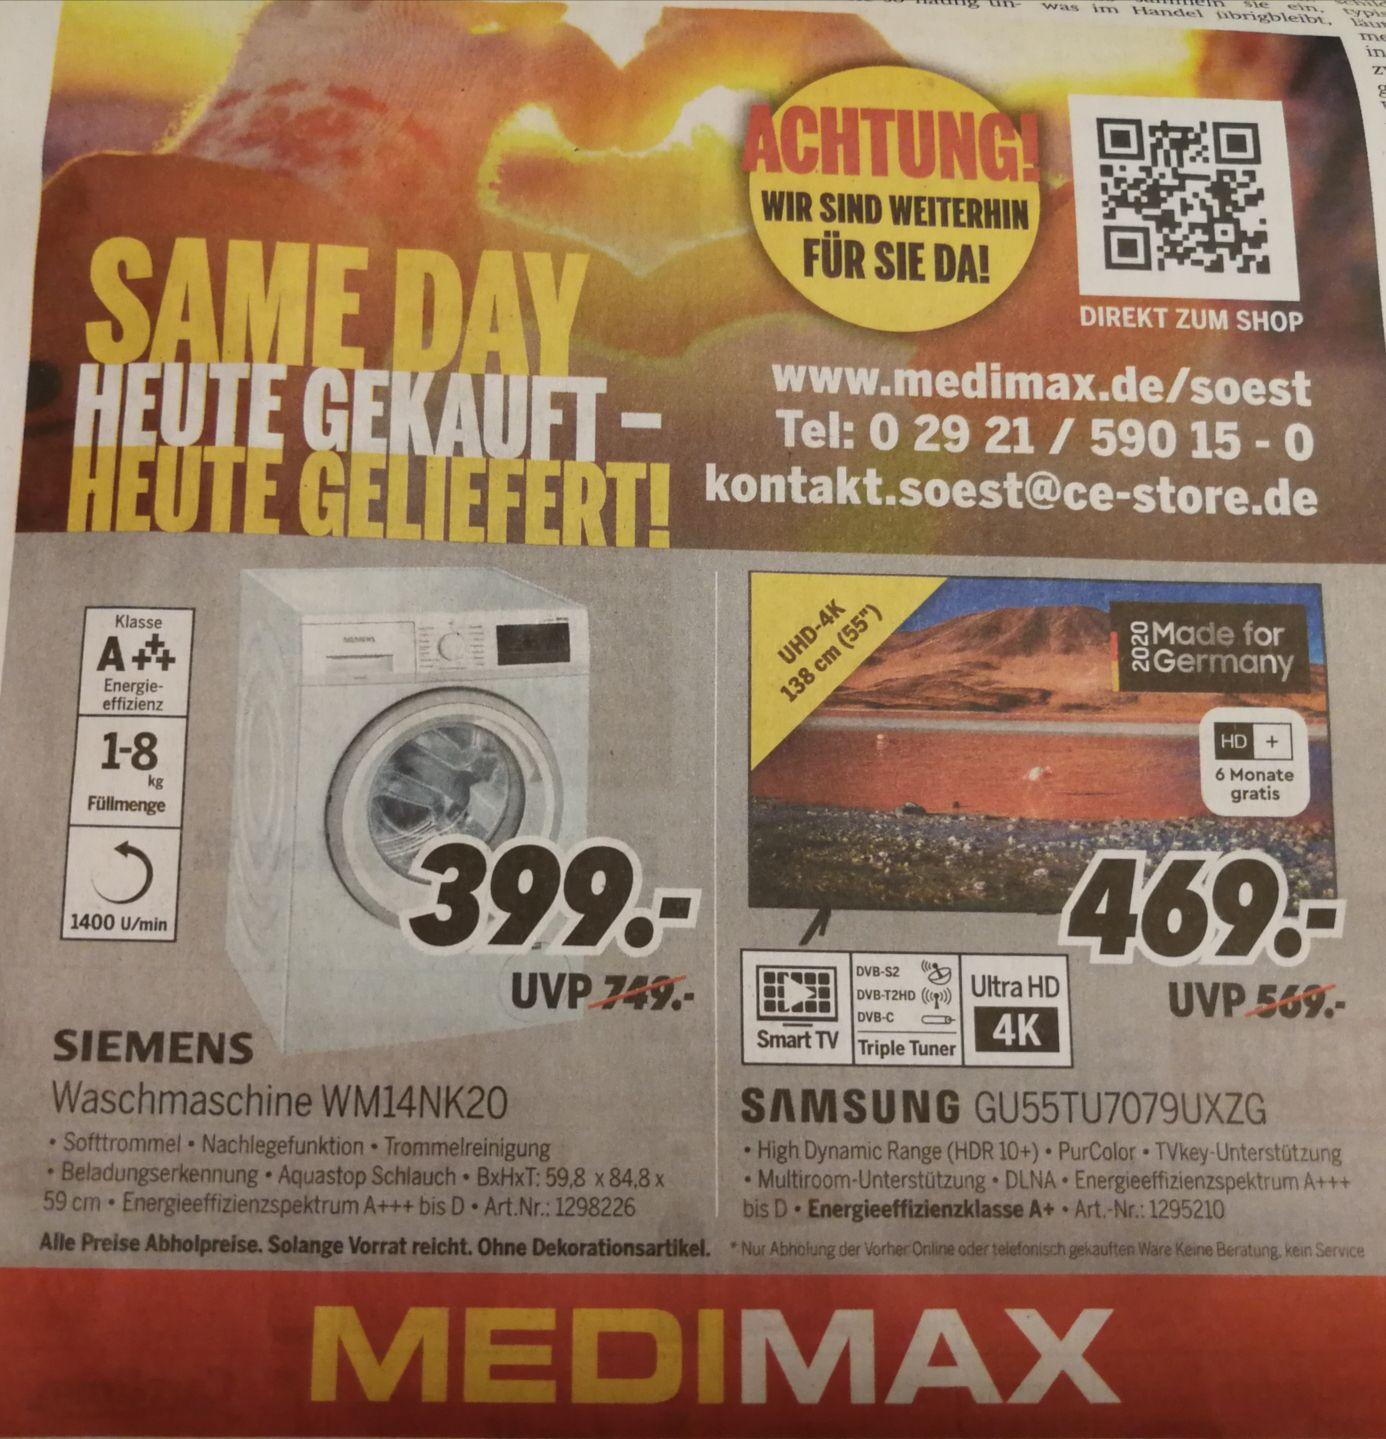 [lokal Soest] Siemens Waschmaschine WM14NK20 // Samsung TV GU55TU7079